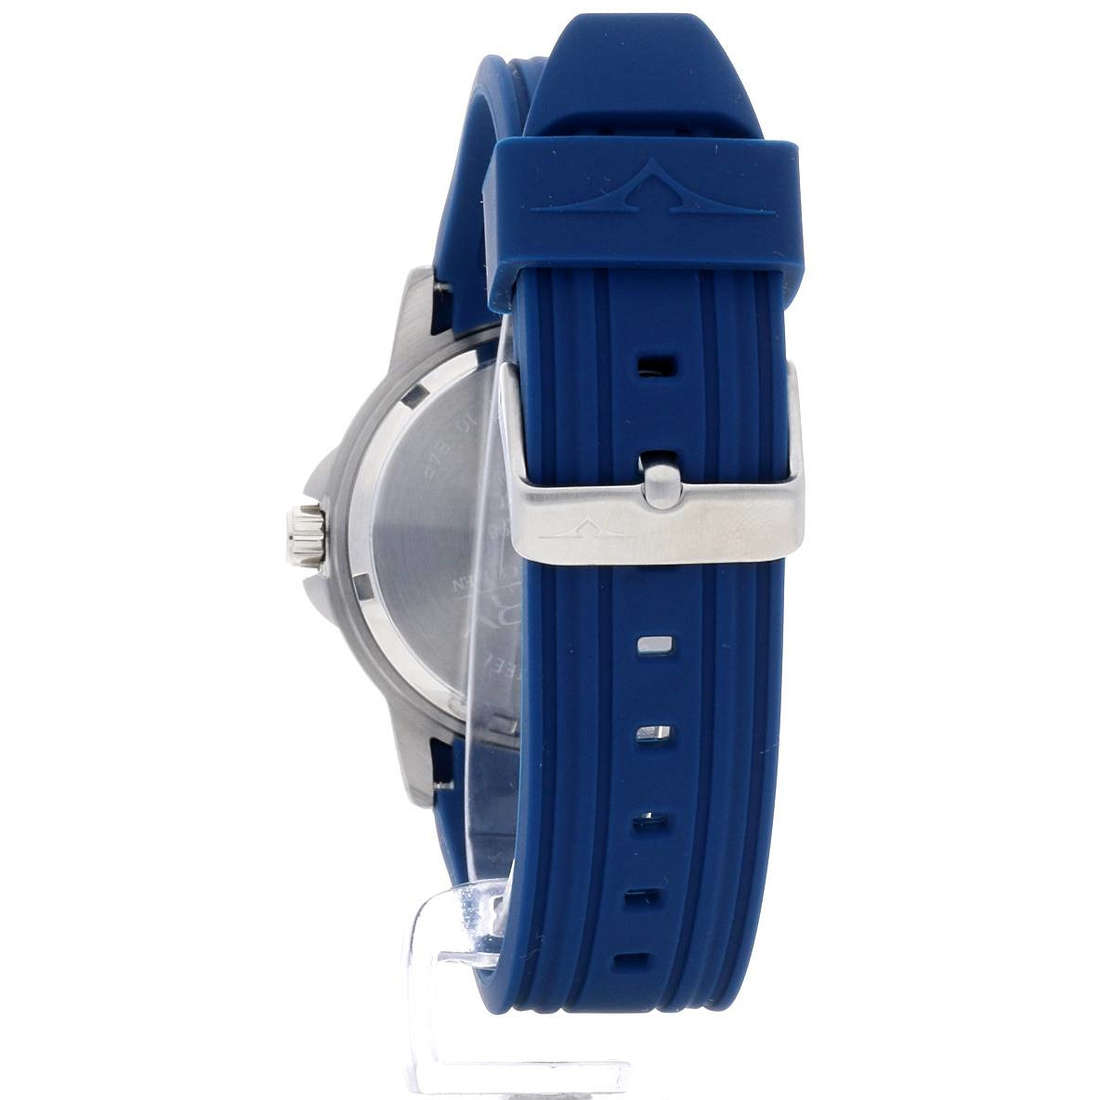 novità orologi uomo Vagary By Citizen IB6-019-70